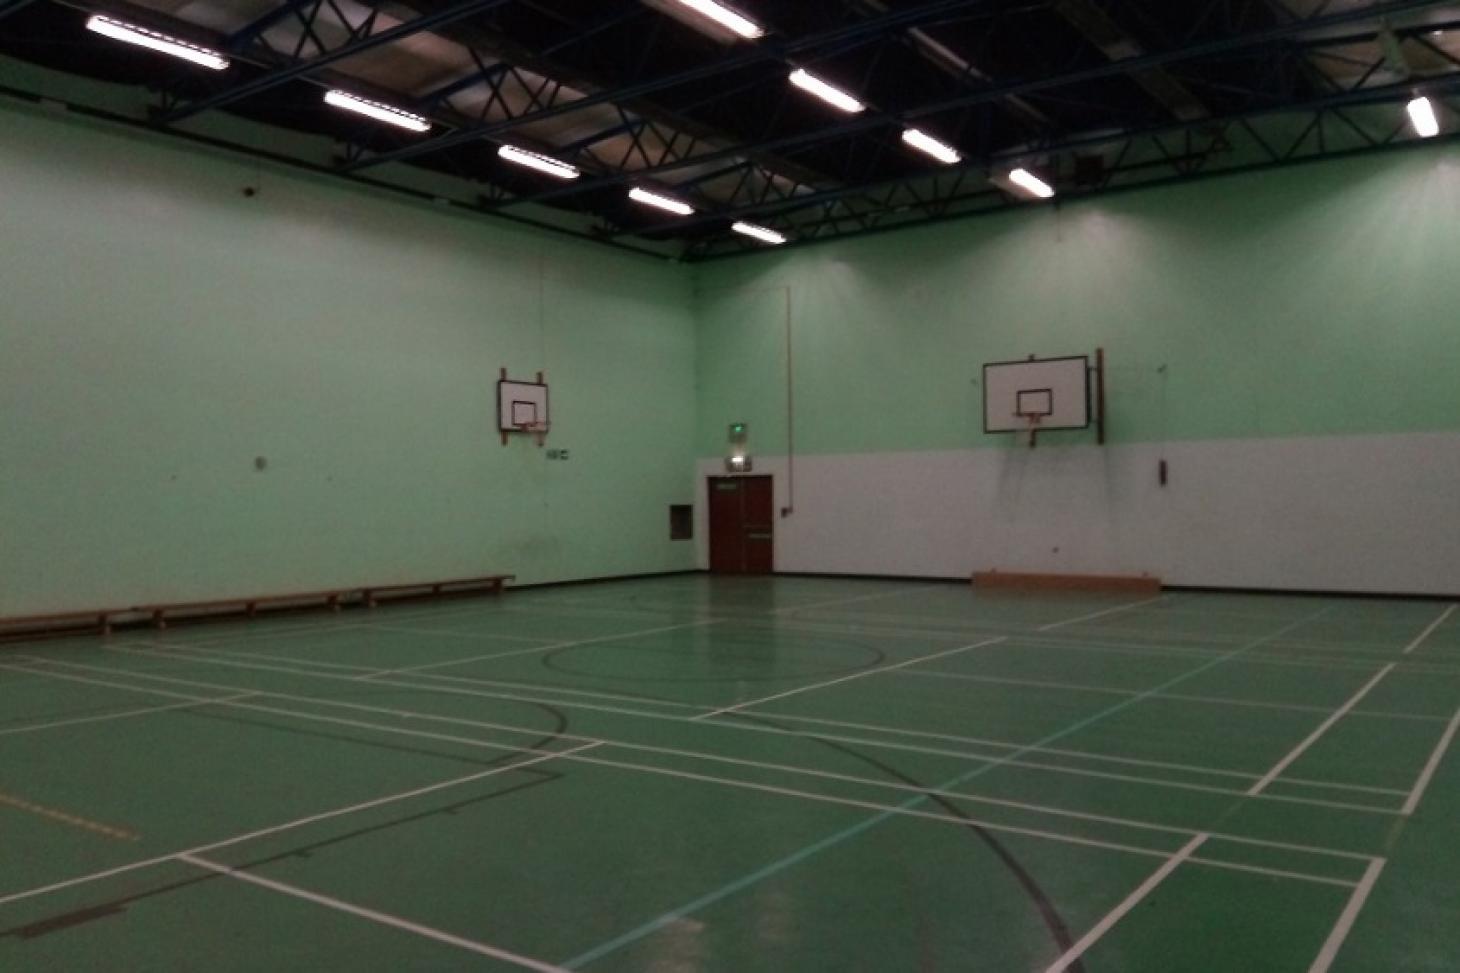 Hazelwick School Indoor basketball court